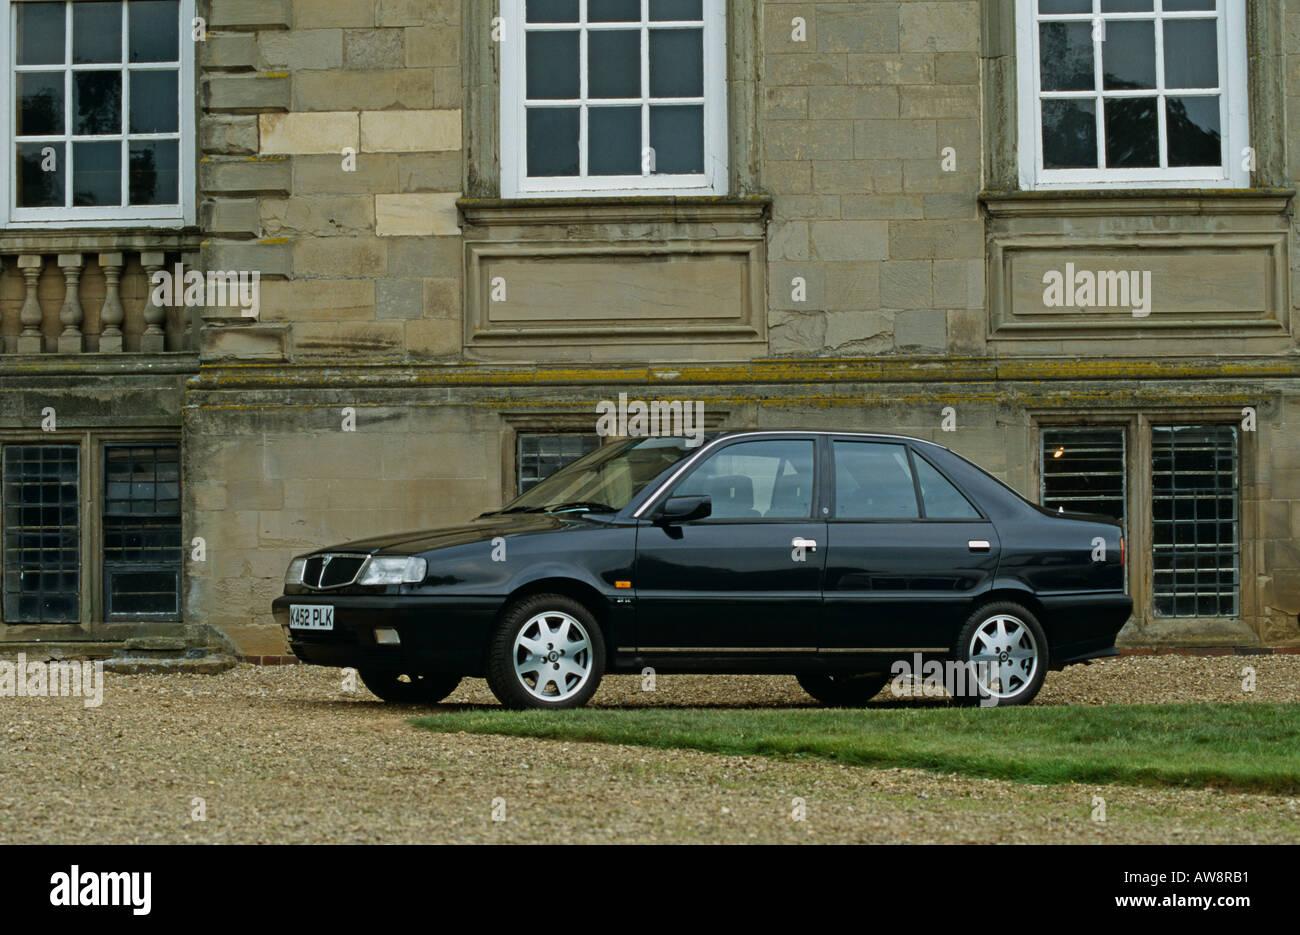 lancia dedra 2 litre ie dedra 1989 to 1999 stock photo: 5388208 - alamy